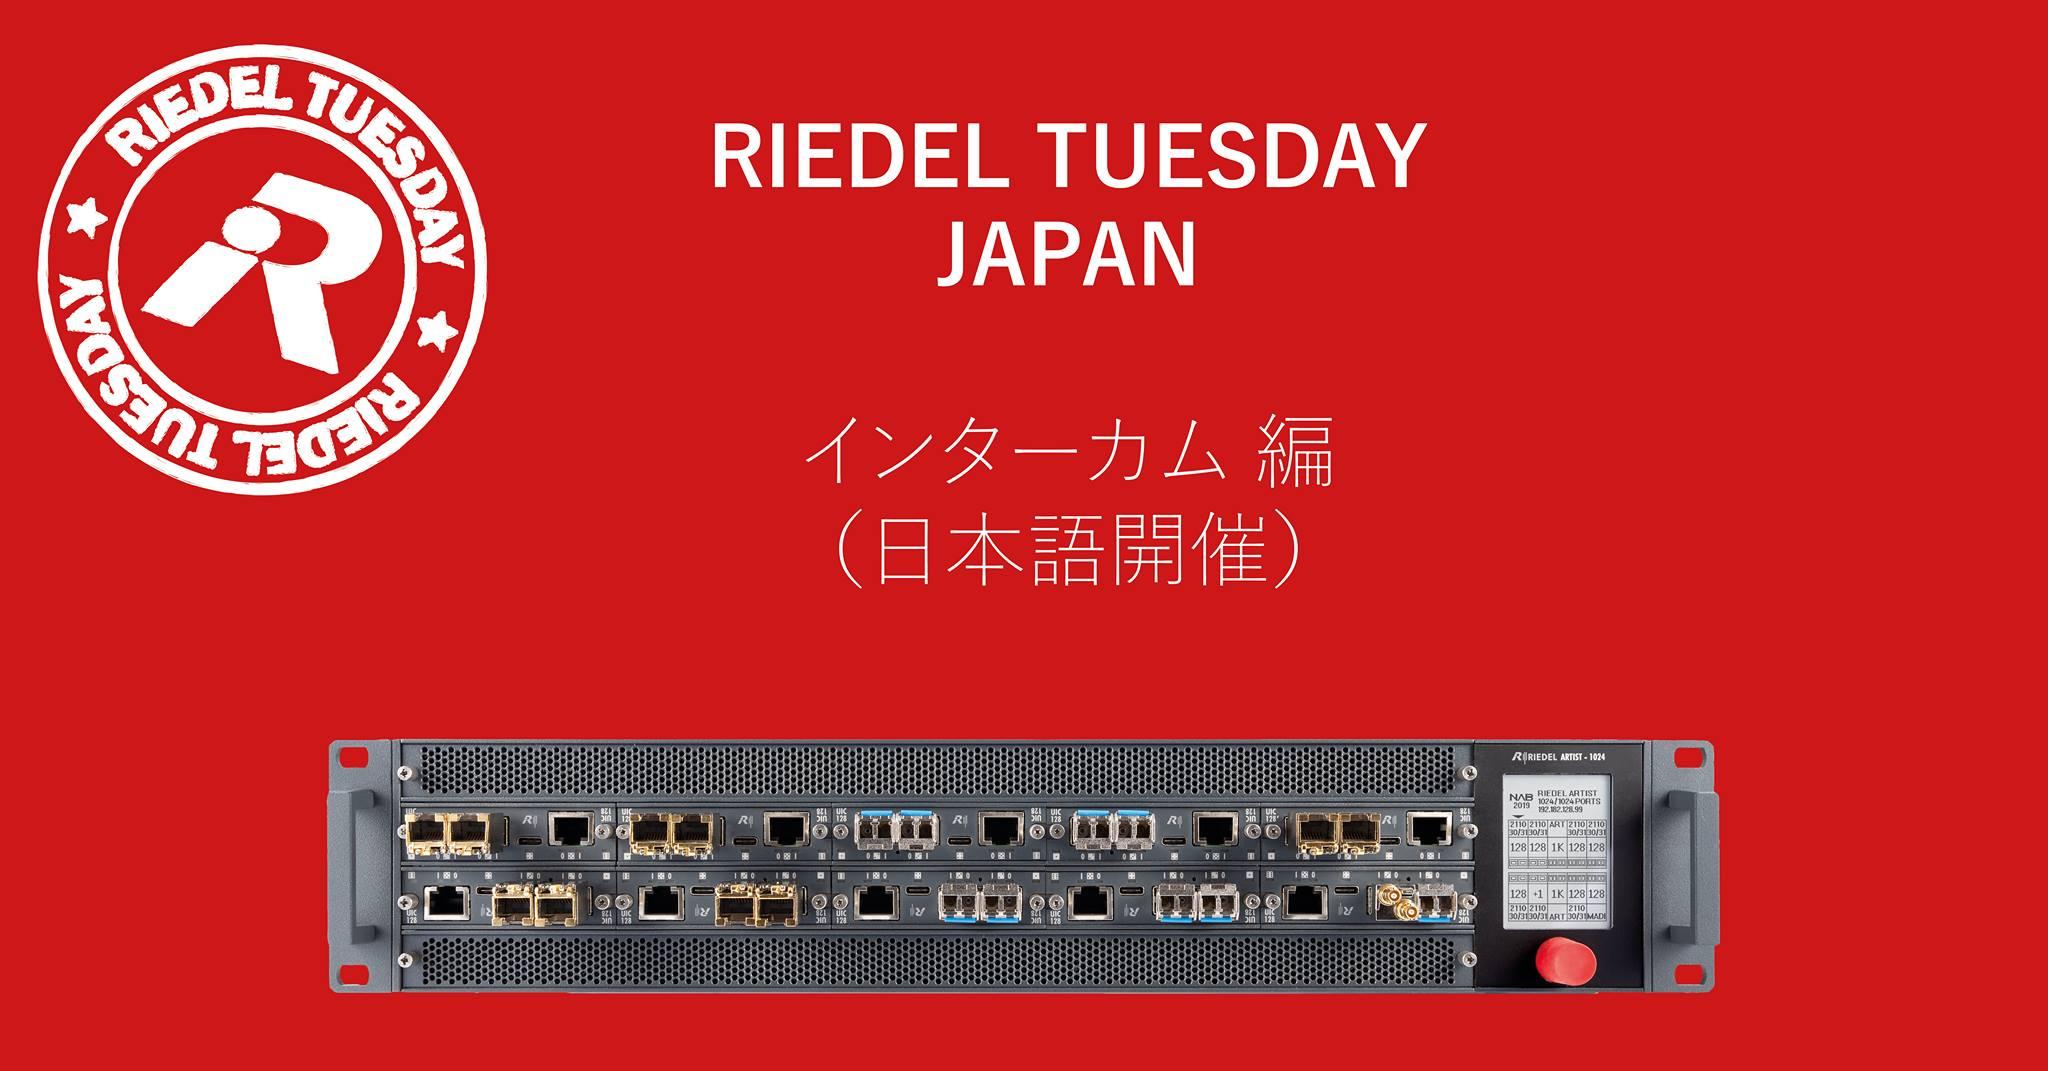 RIEDEL チューズデイジャパン